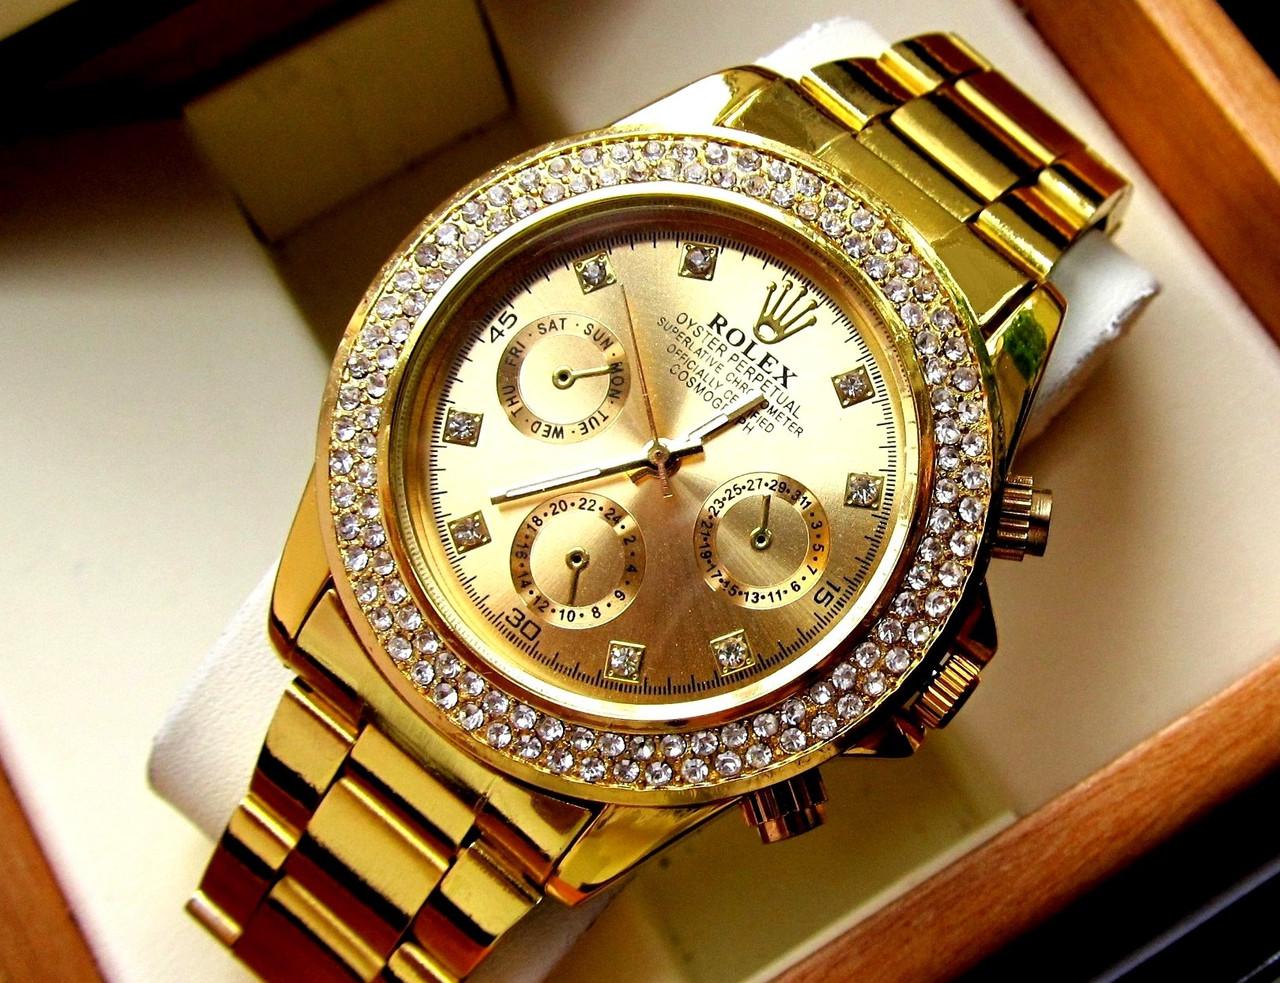 Цены на наручные часы ролекс часы айфон купить в астане